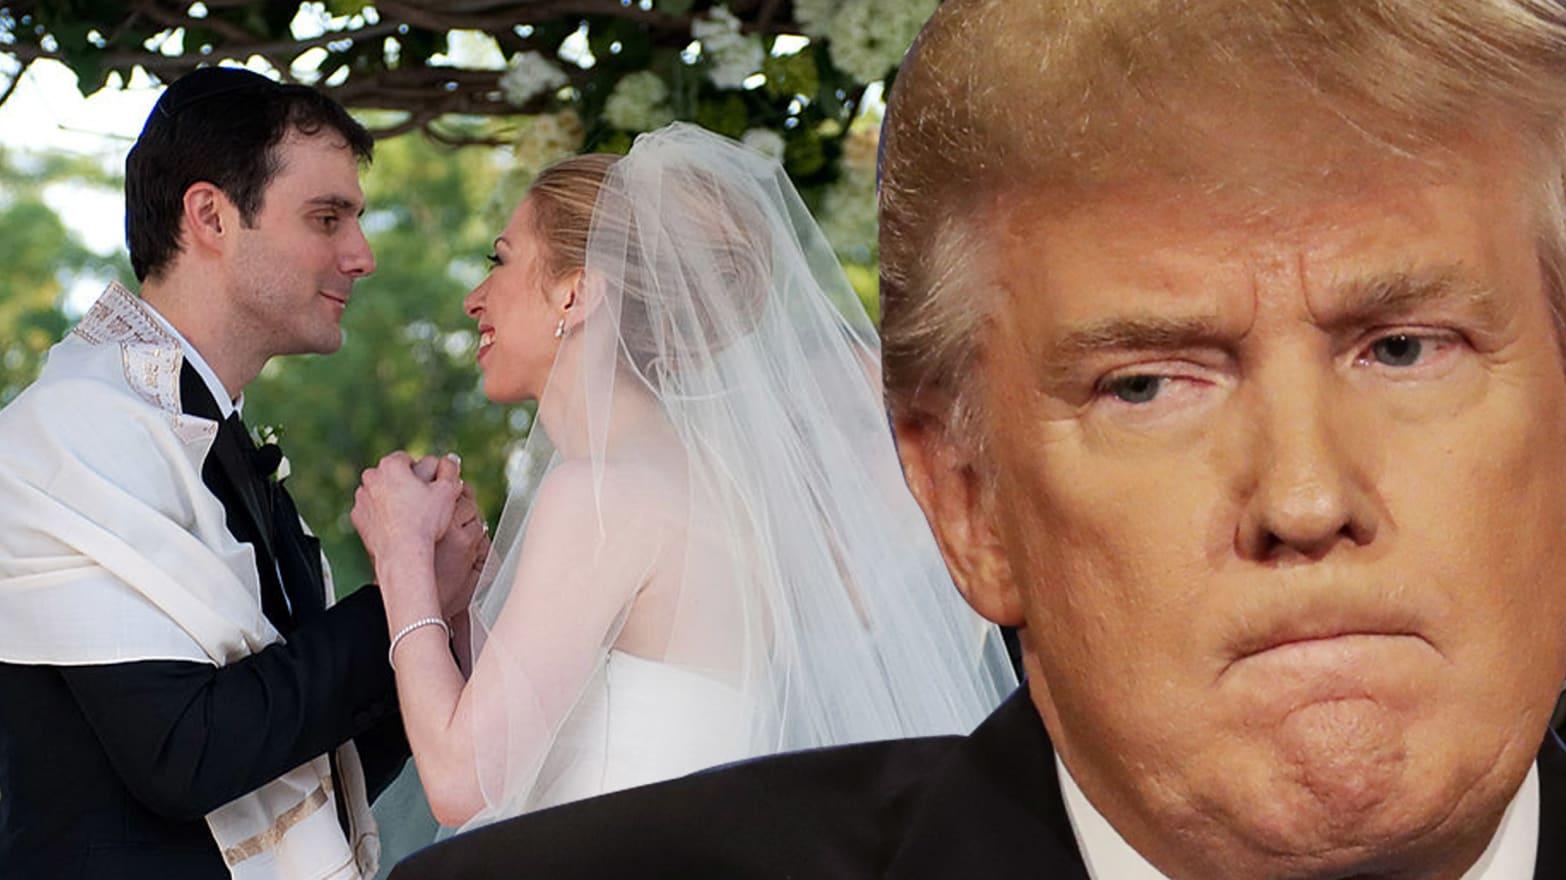 Trump Crashes Wedding.When Donald Trump Tried To Crash Chelsea Clinton S Wedding